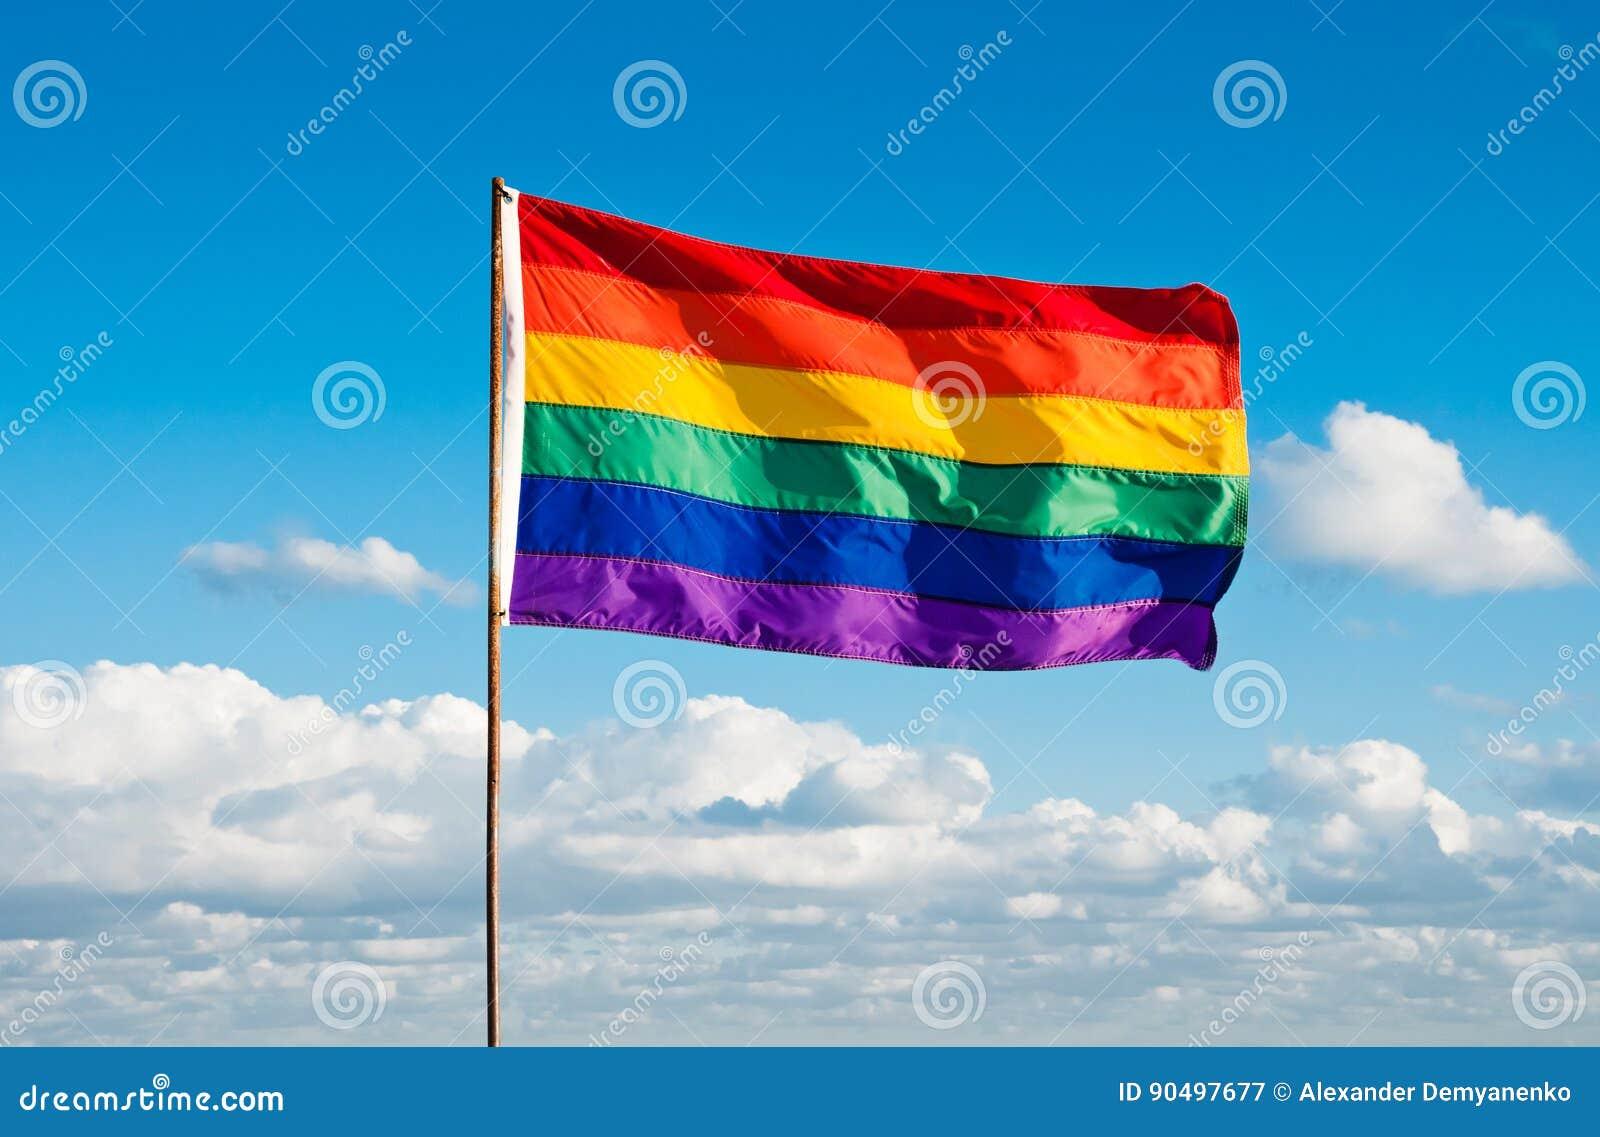 Regenbogen homosexuelles Pride Flag, Miami Beach, Florida